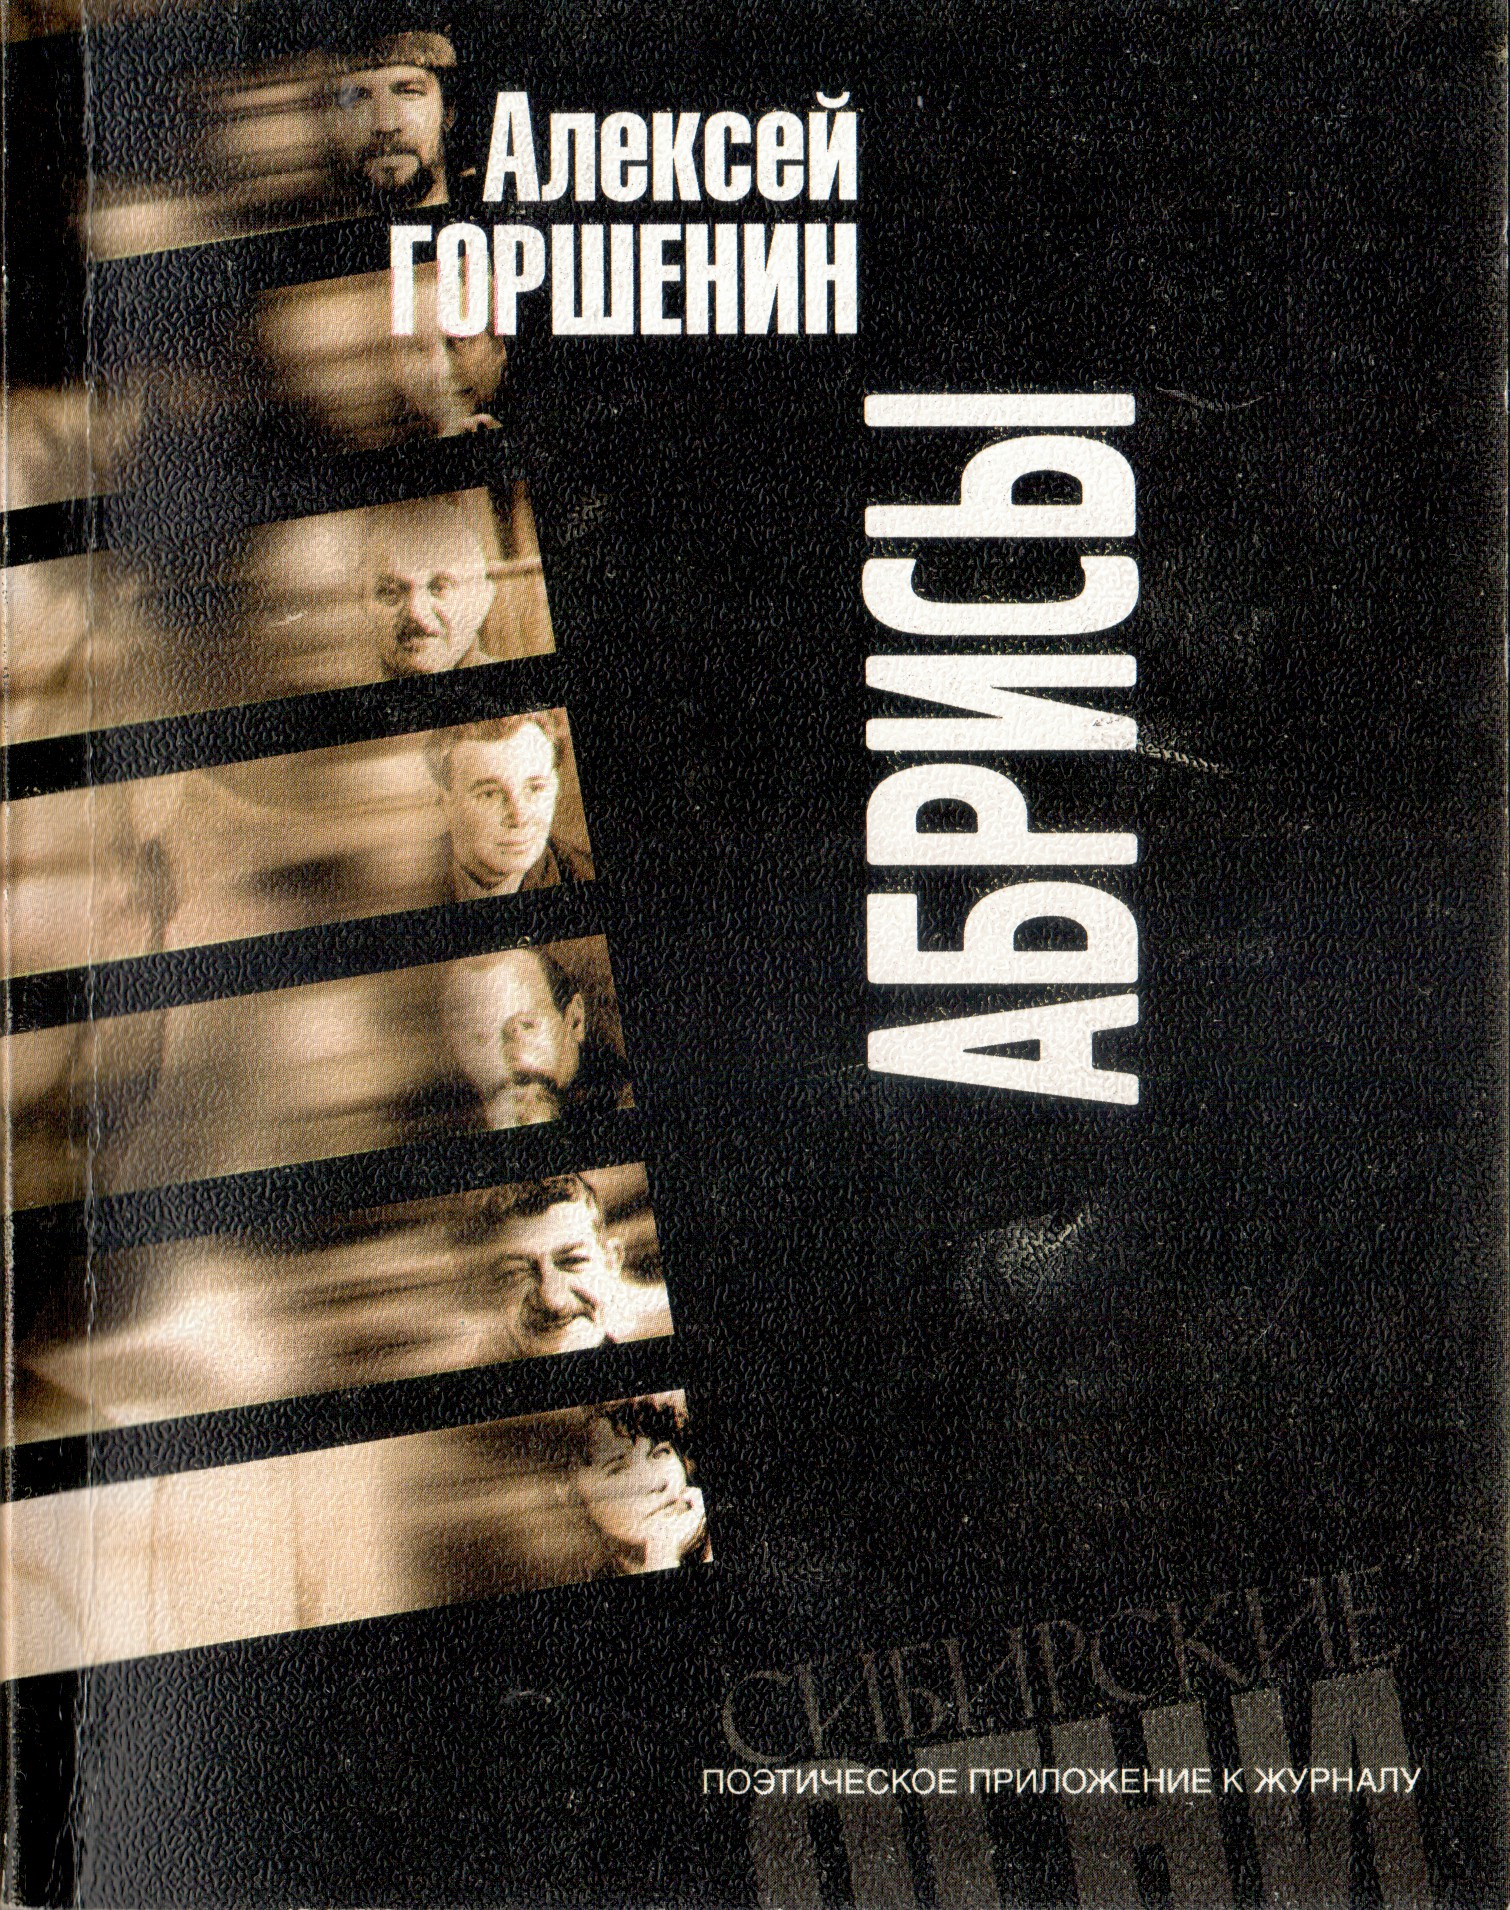 А. Горшенин - Абрисы